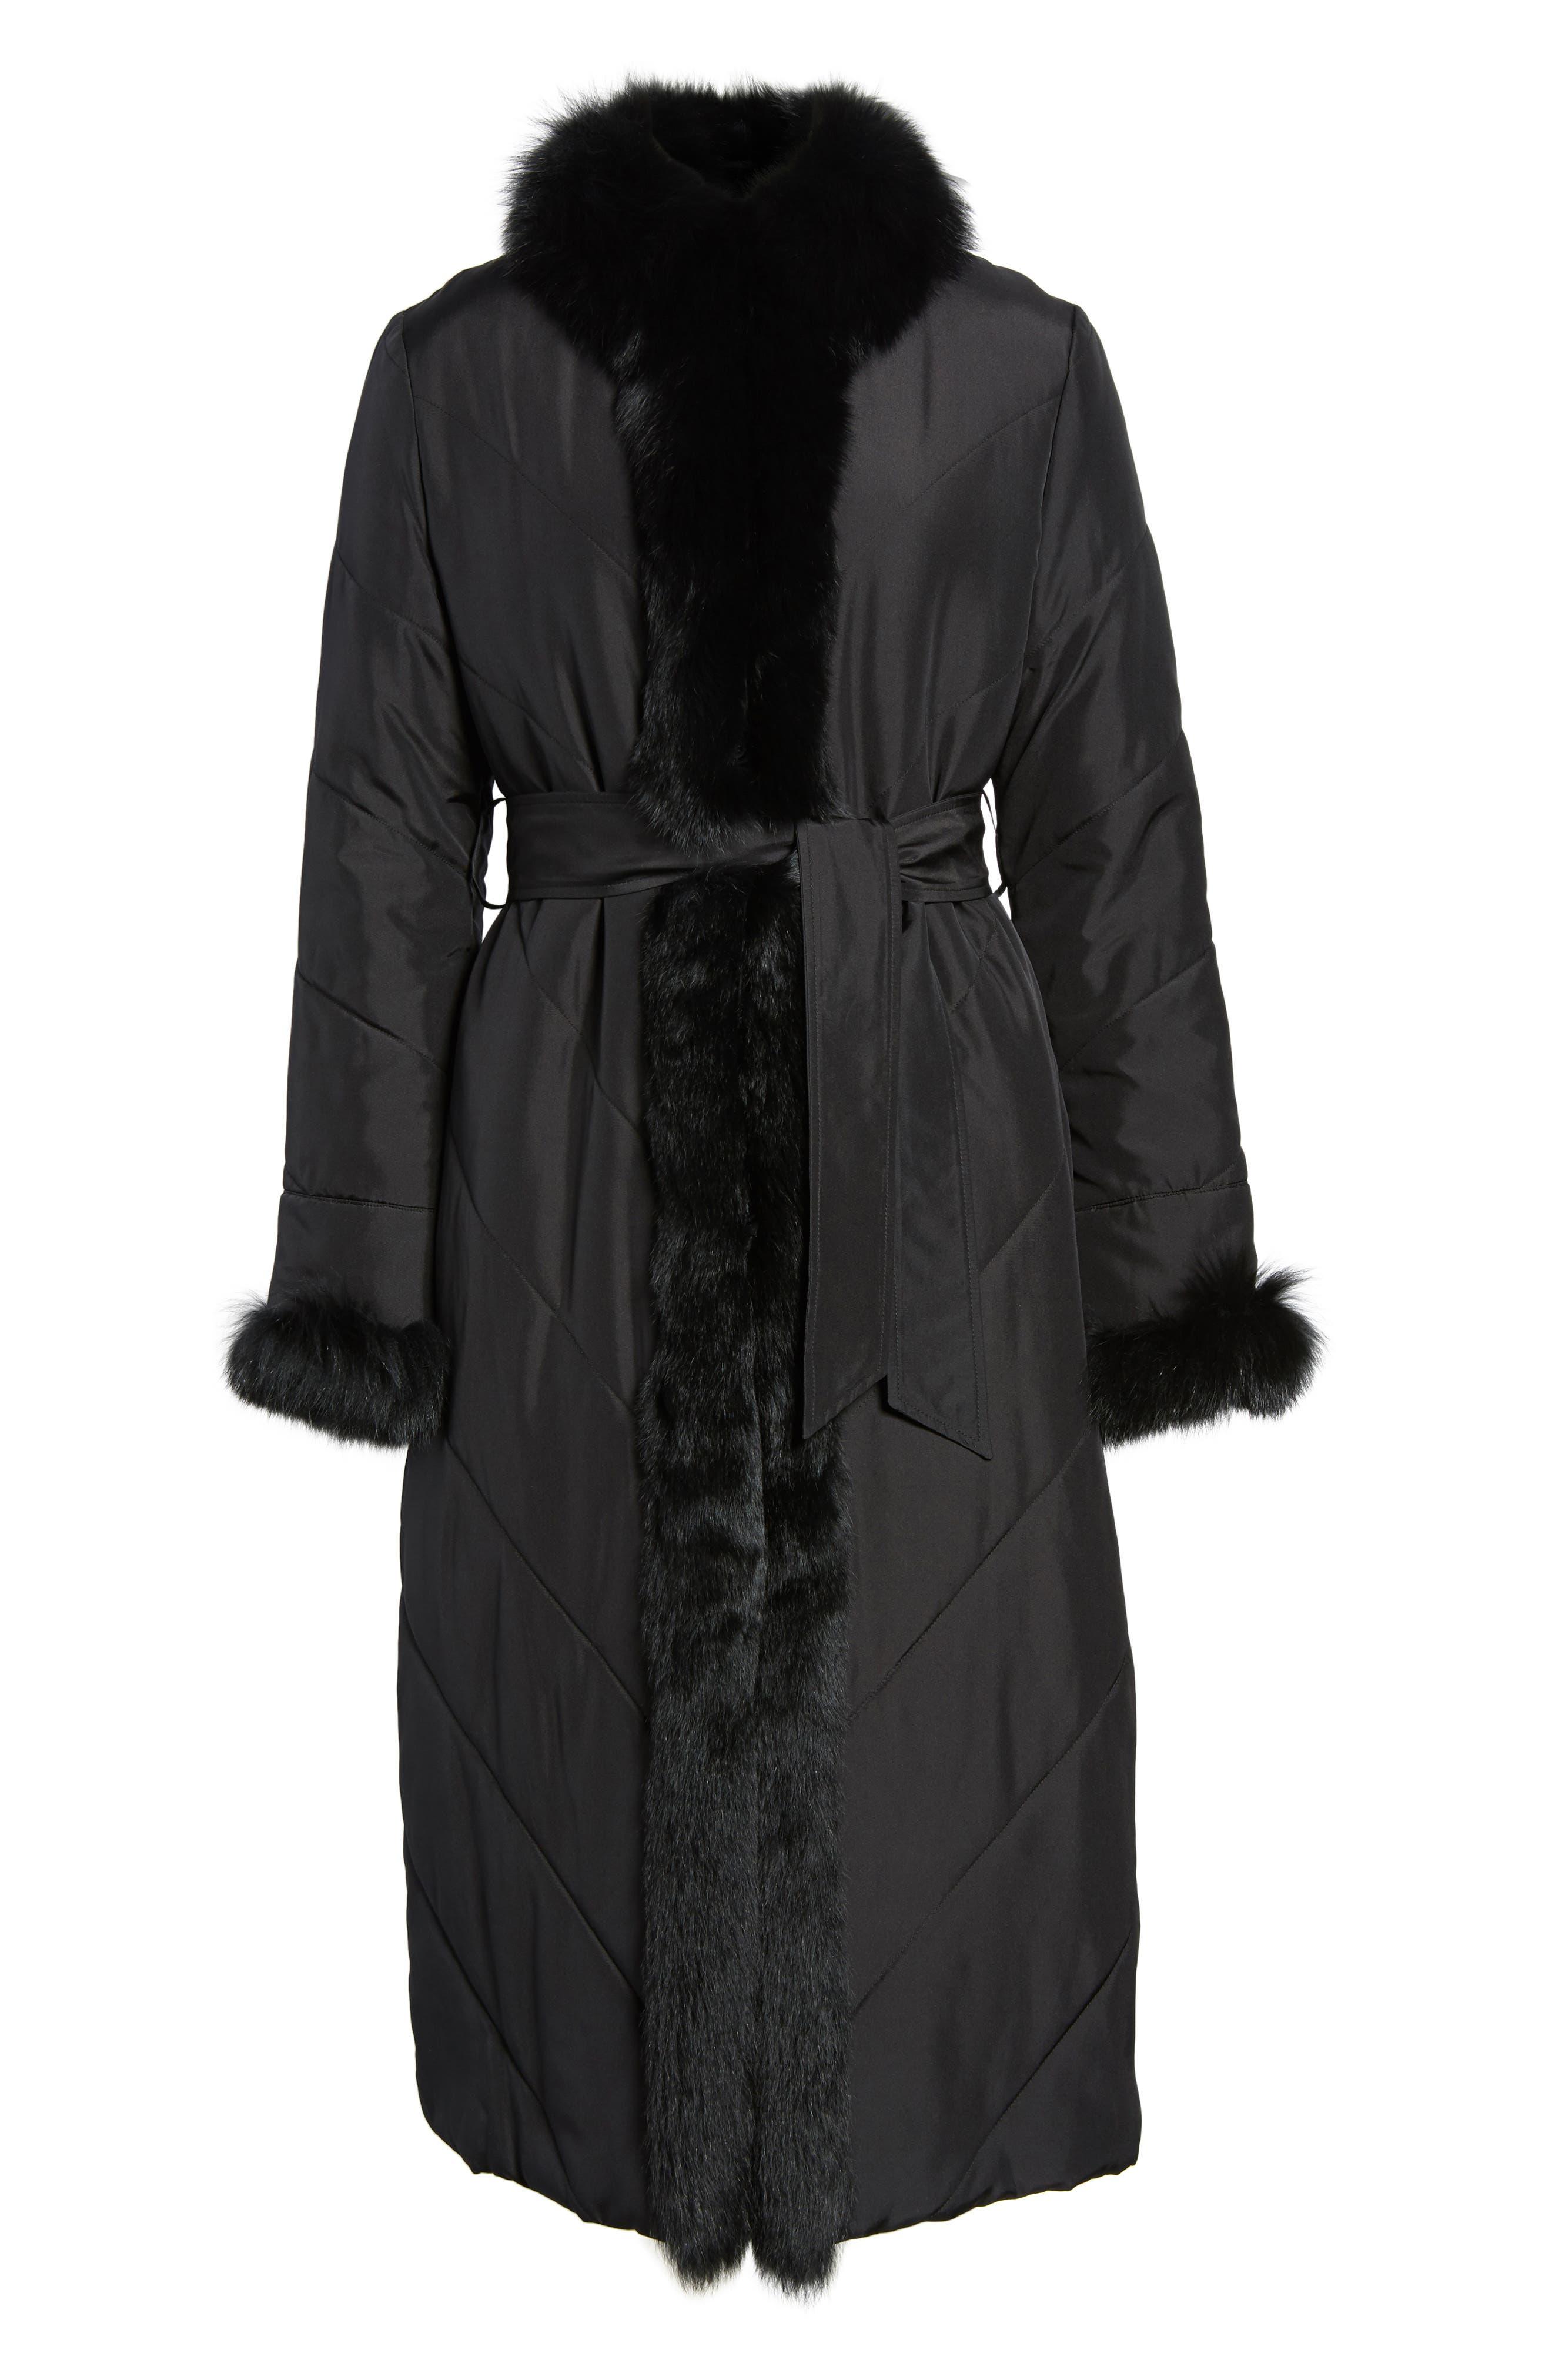 Couture Packable Silk Coat with Genuine Fox Fur & Genuine Rabbit Fur,                             Alternate thumbnail 5, color,                             001